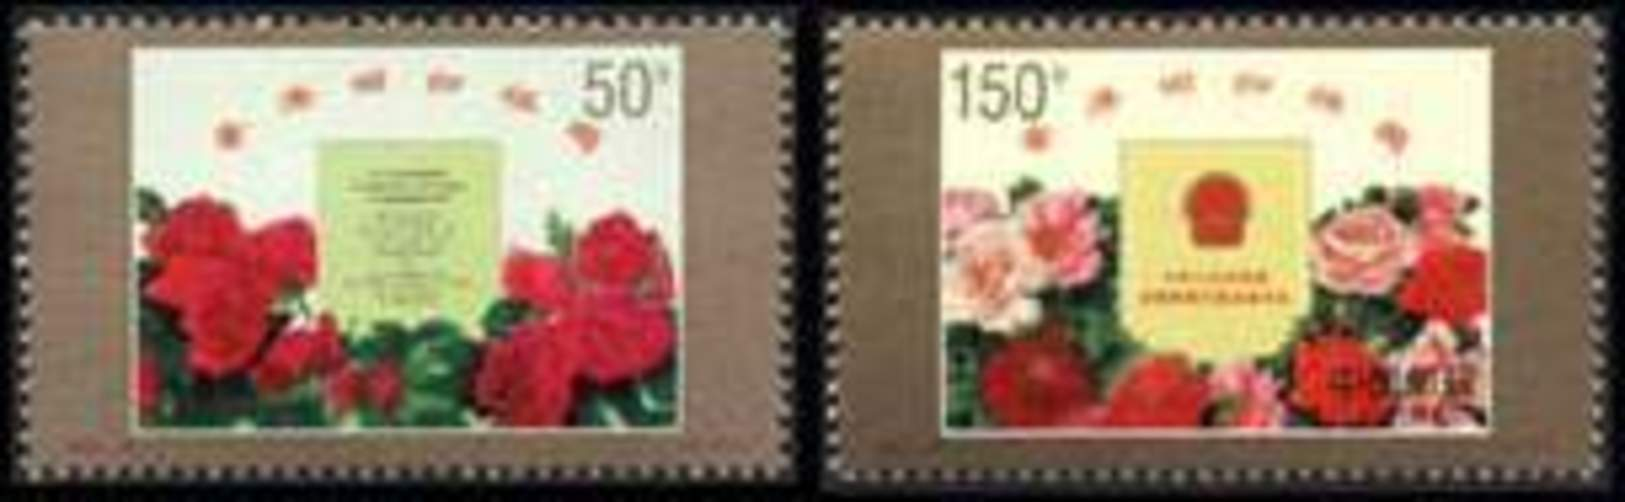 1997 CHINA 97-10 Hong Kong Return To China 2v Stamp - Ongebruikt